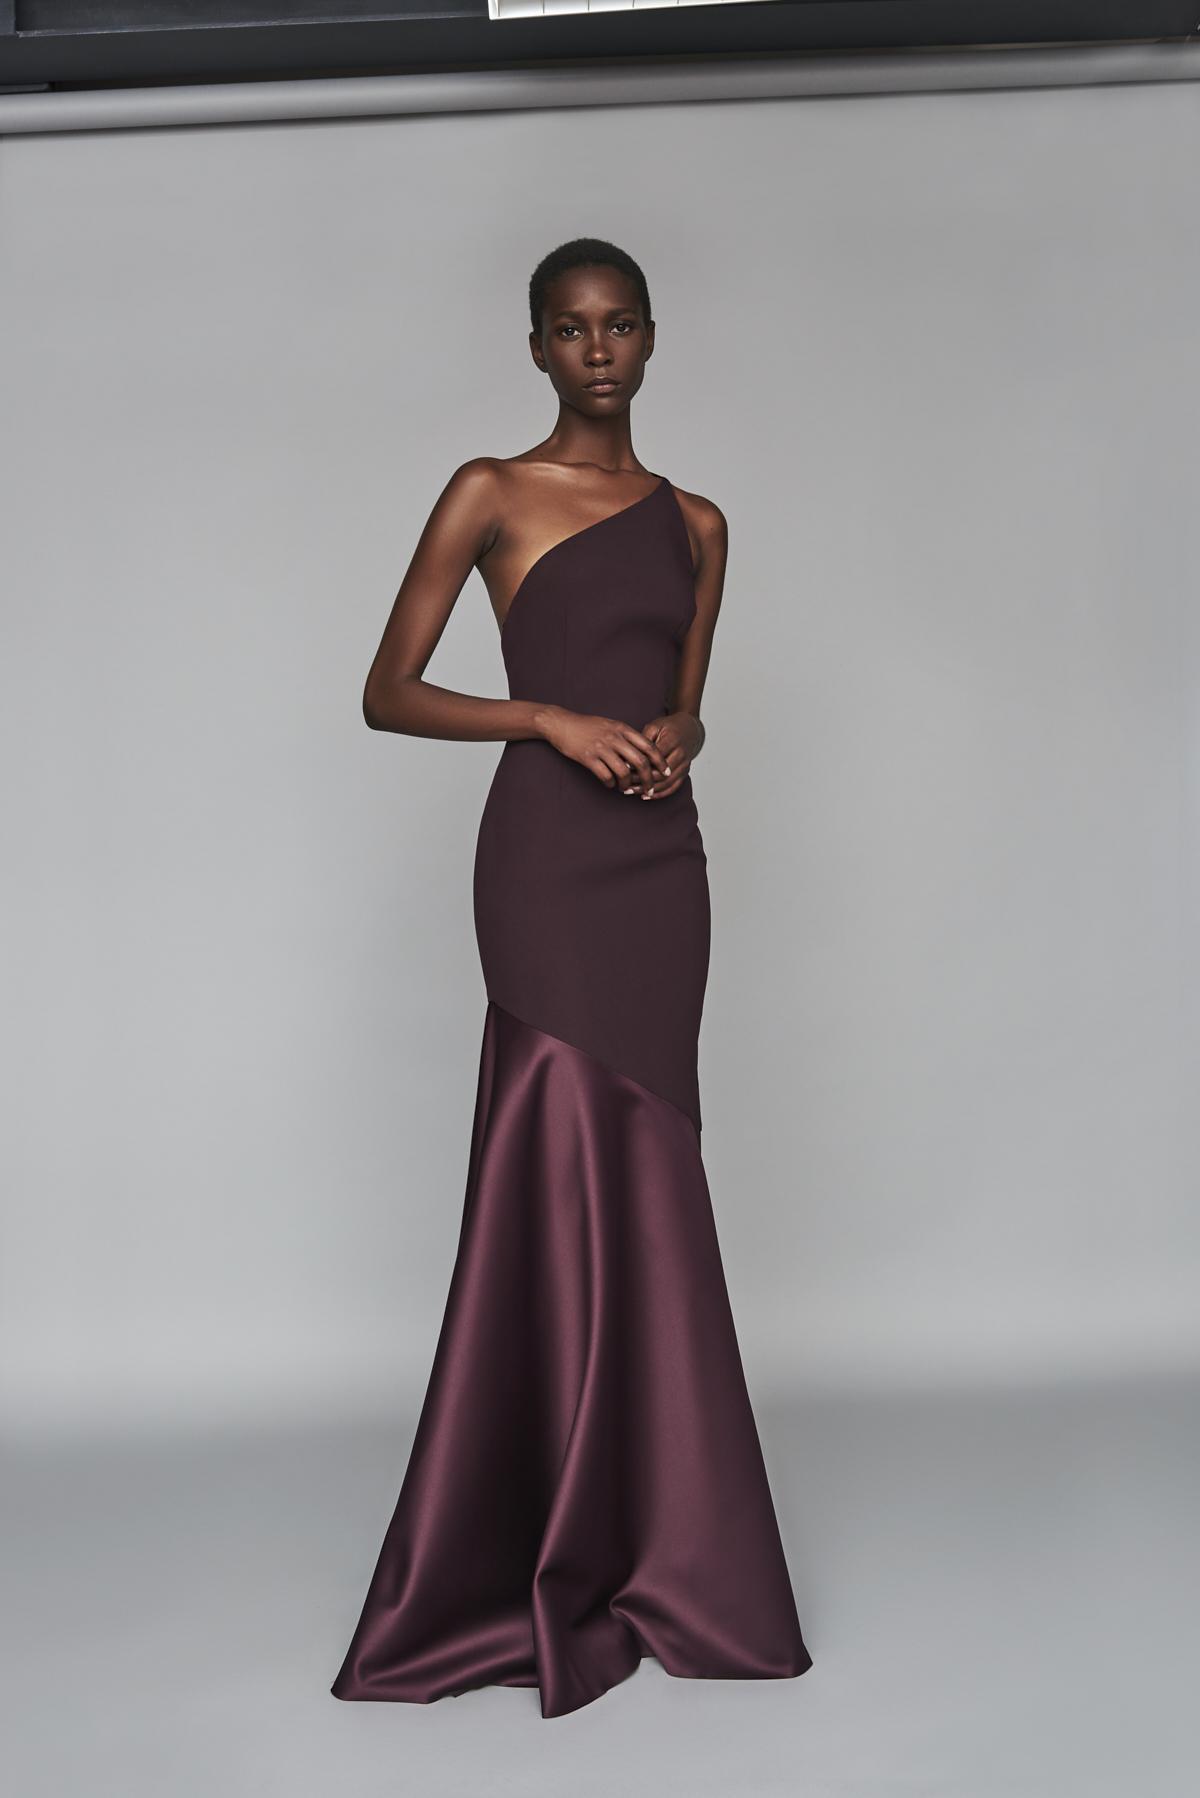 a681a3254bb Solace London Violeta Maxi Dress Aubergine - Lyst